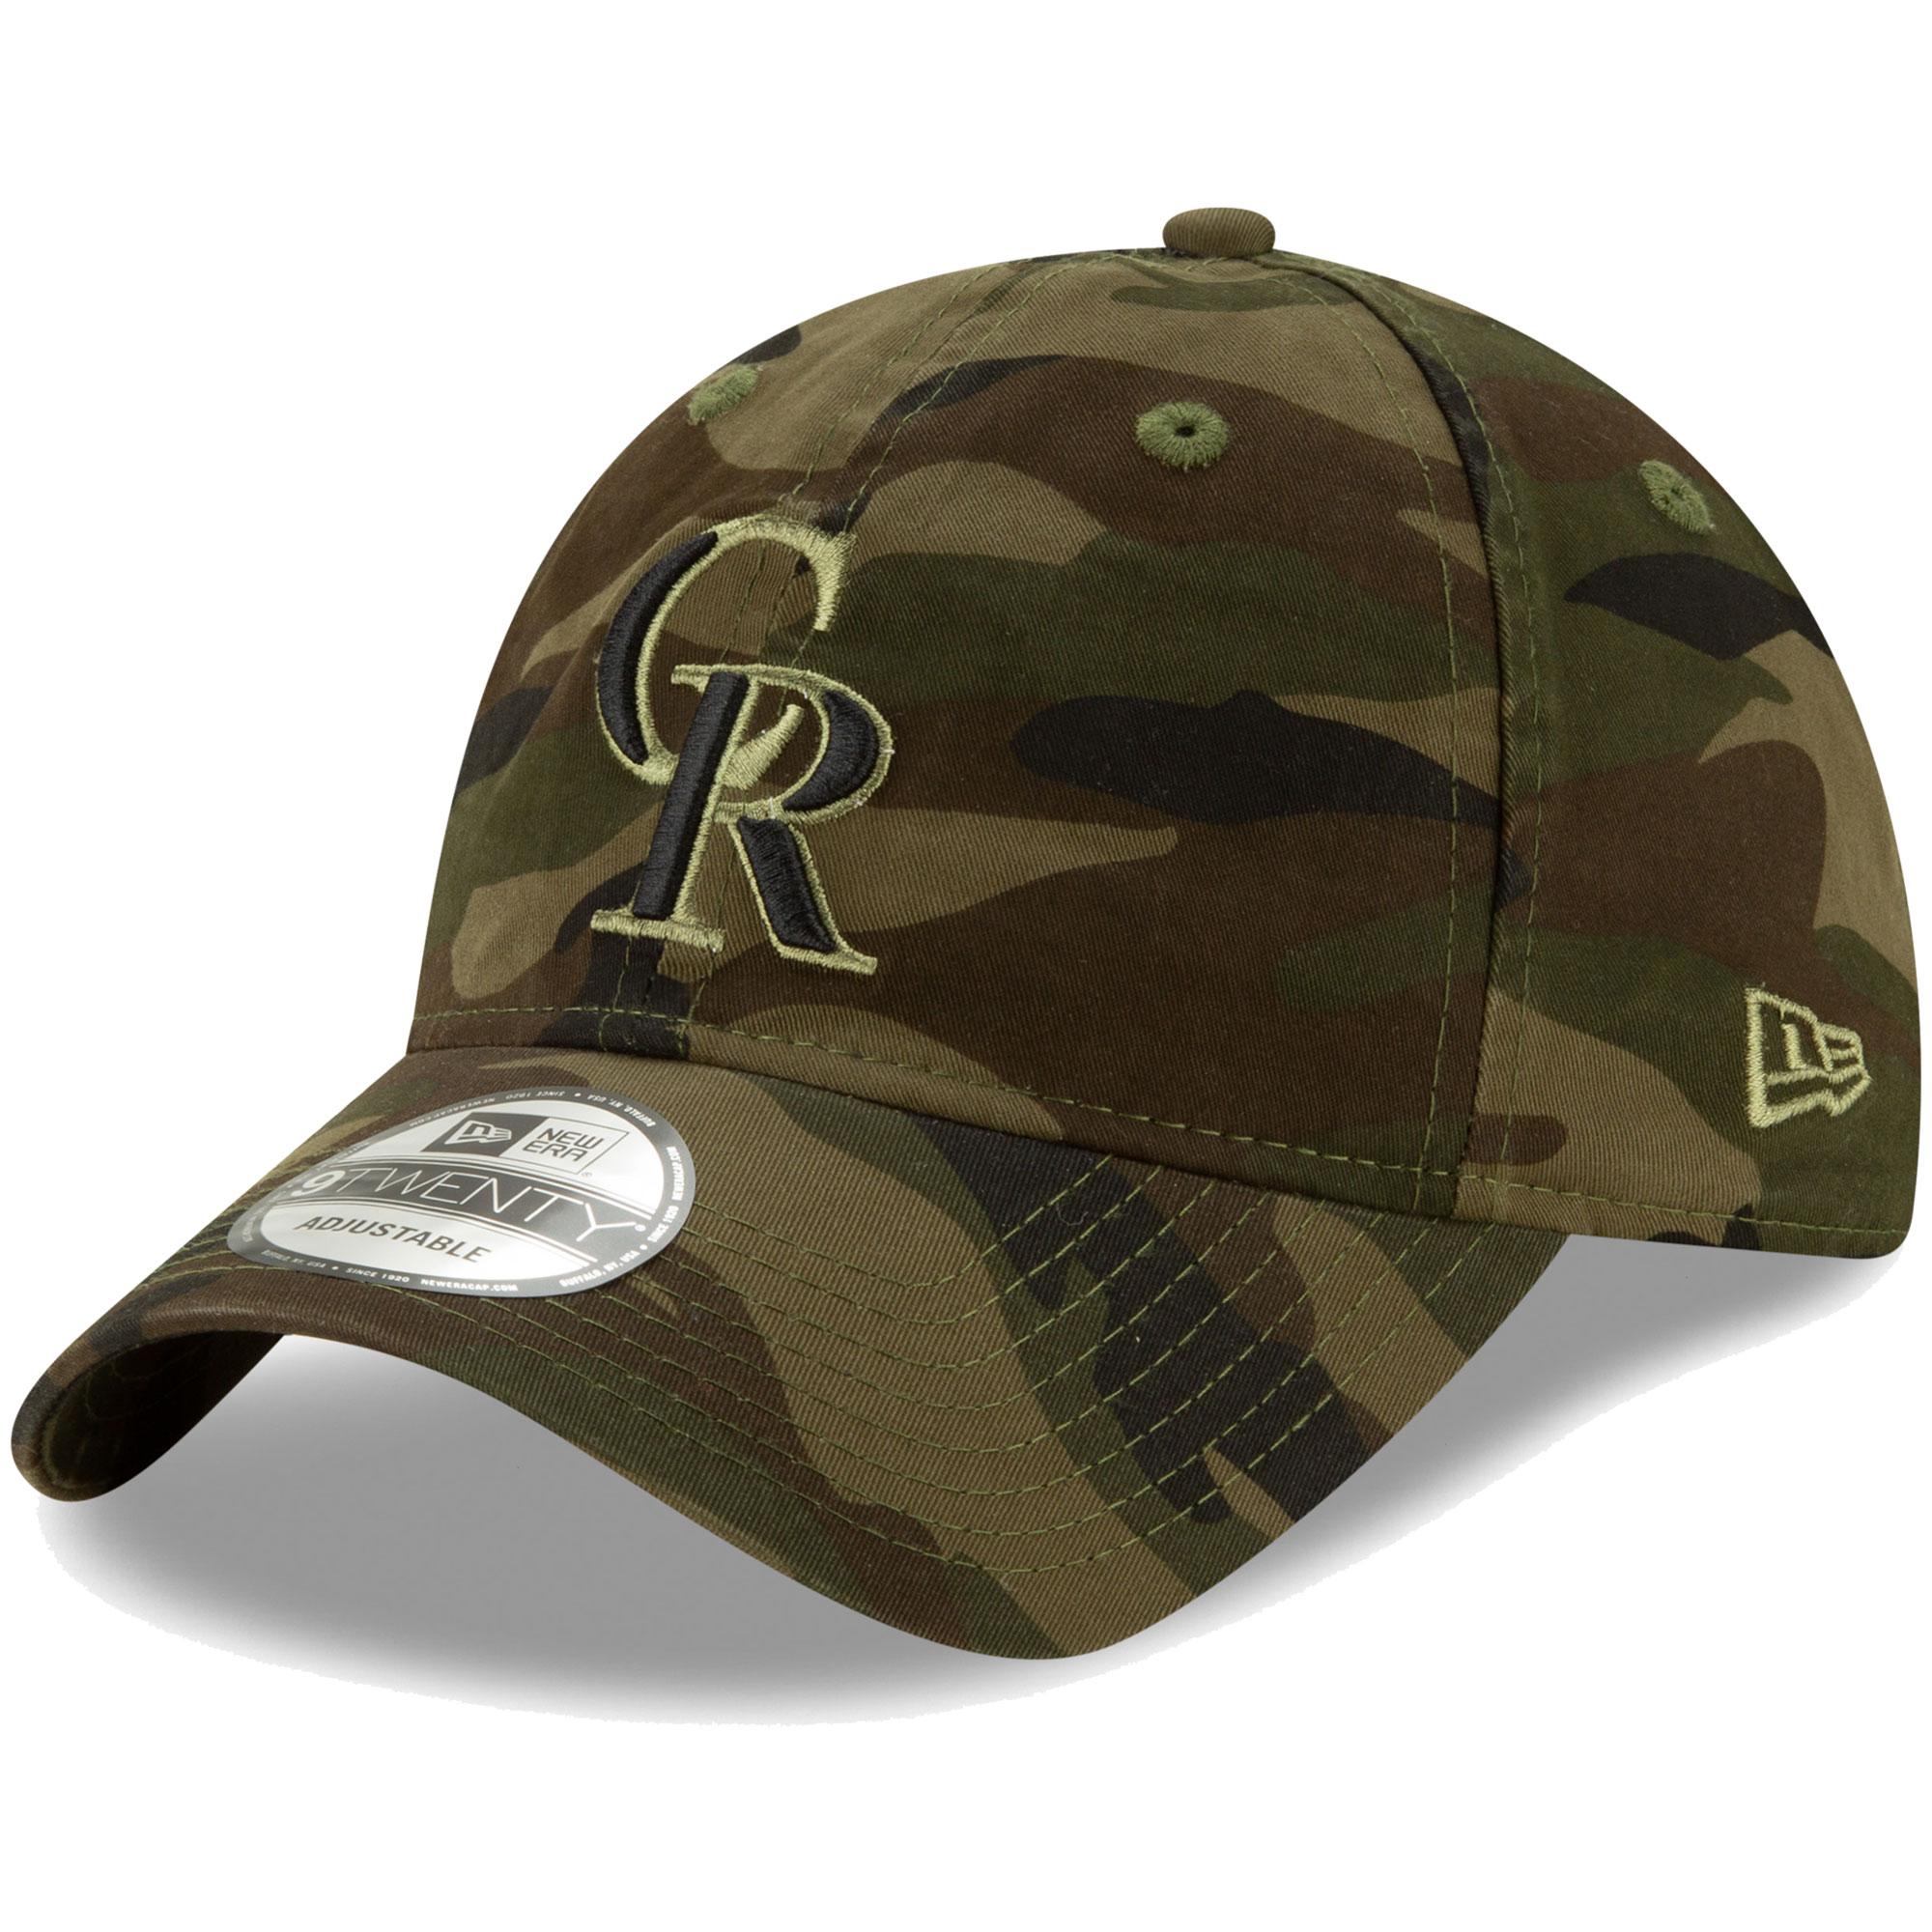 Colorado Rockies New Era Tonal Camo Core Classic 9TWENTY Adjustable Hat - Camo - OSFA